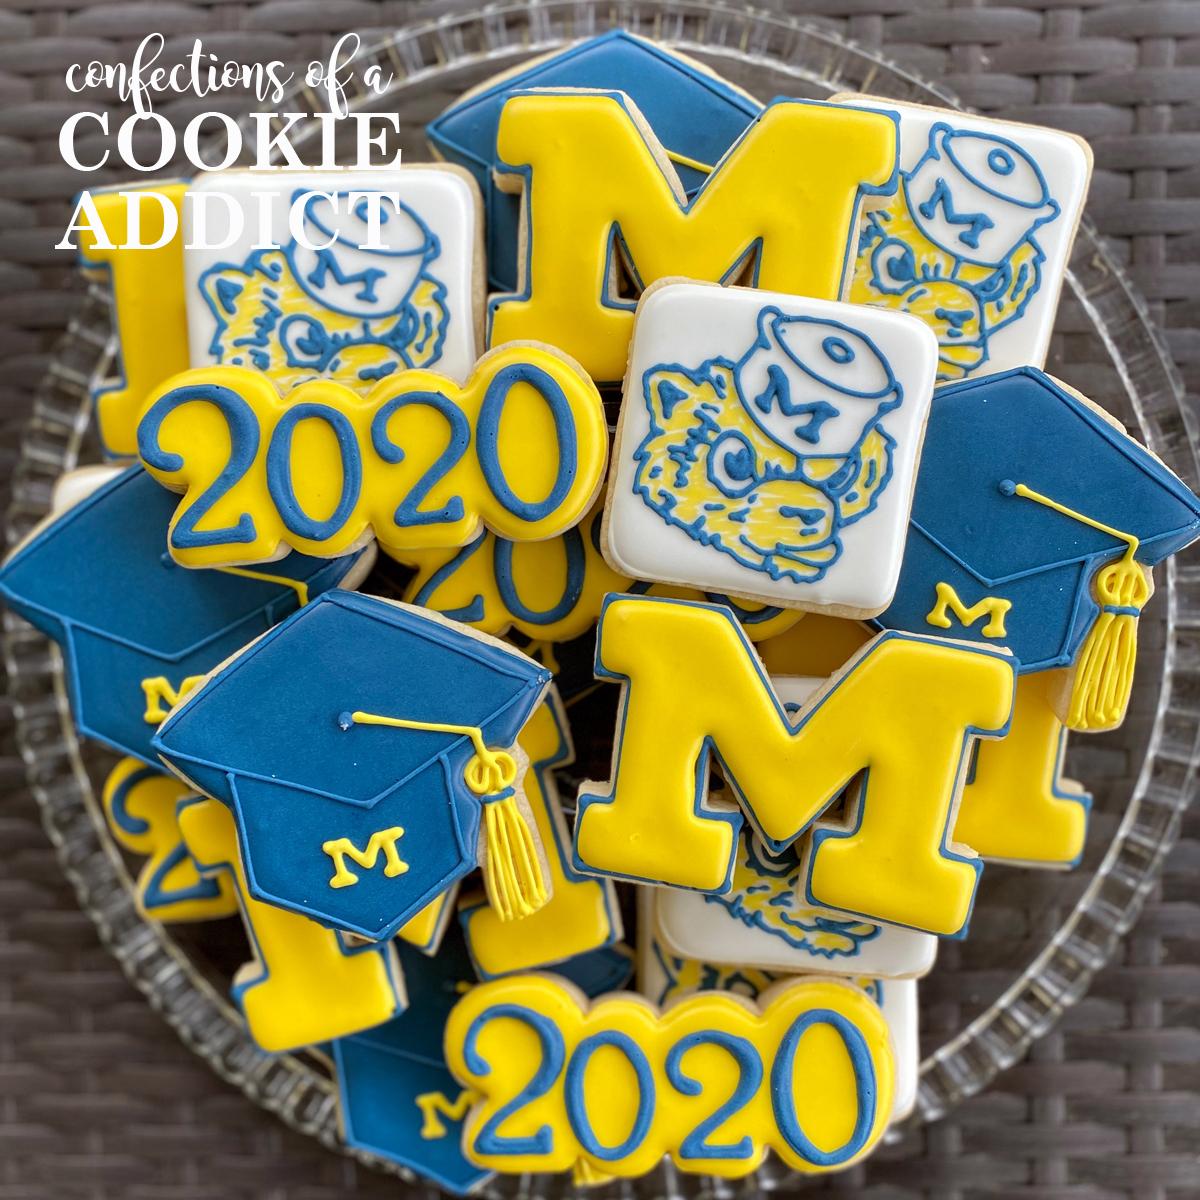 University of Michigan Cookies